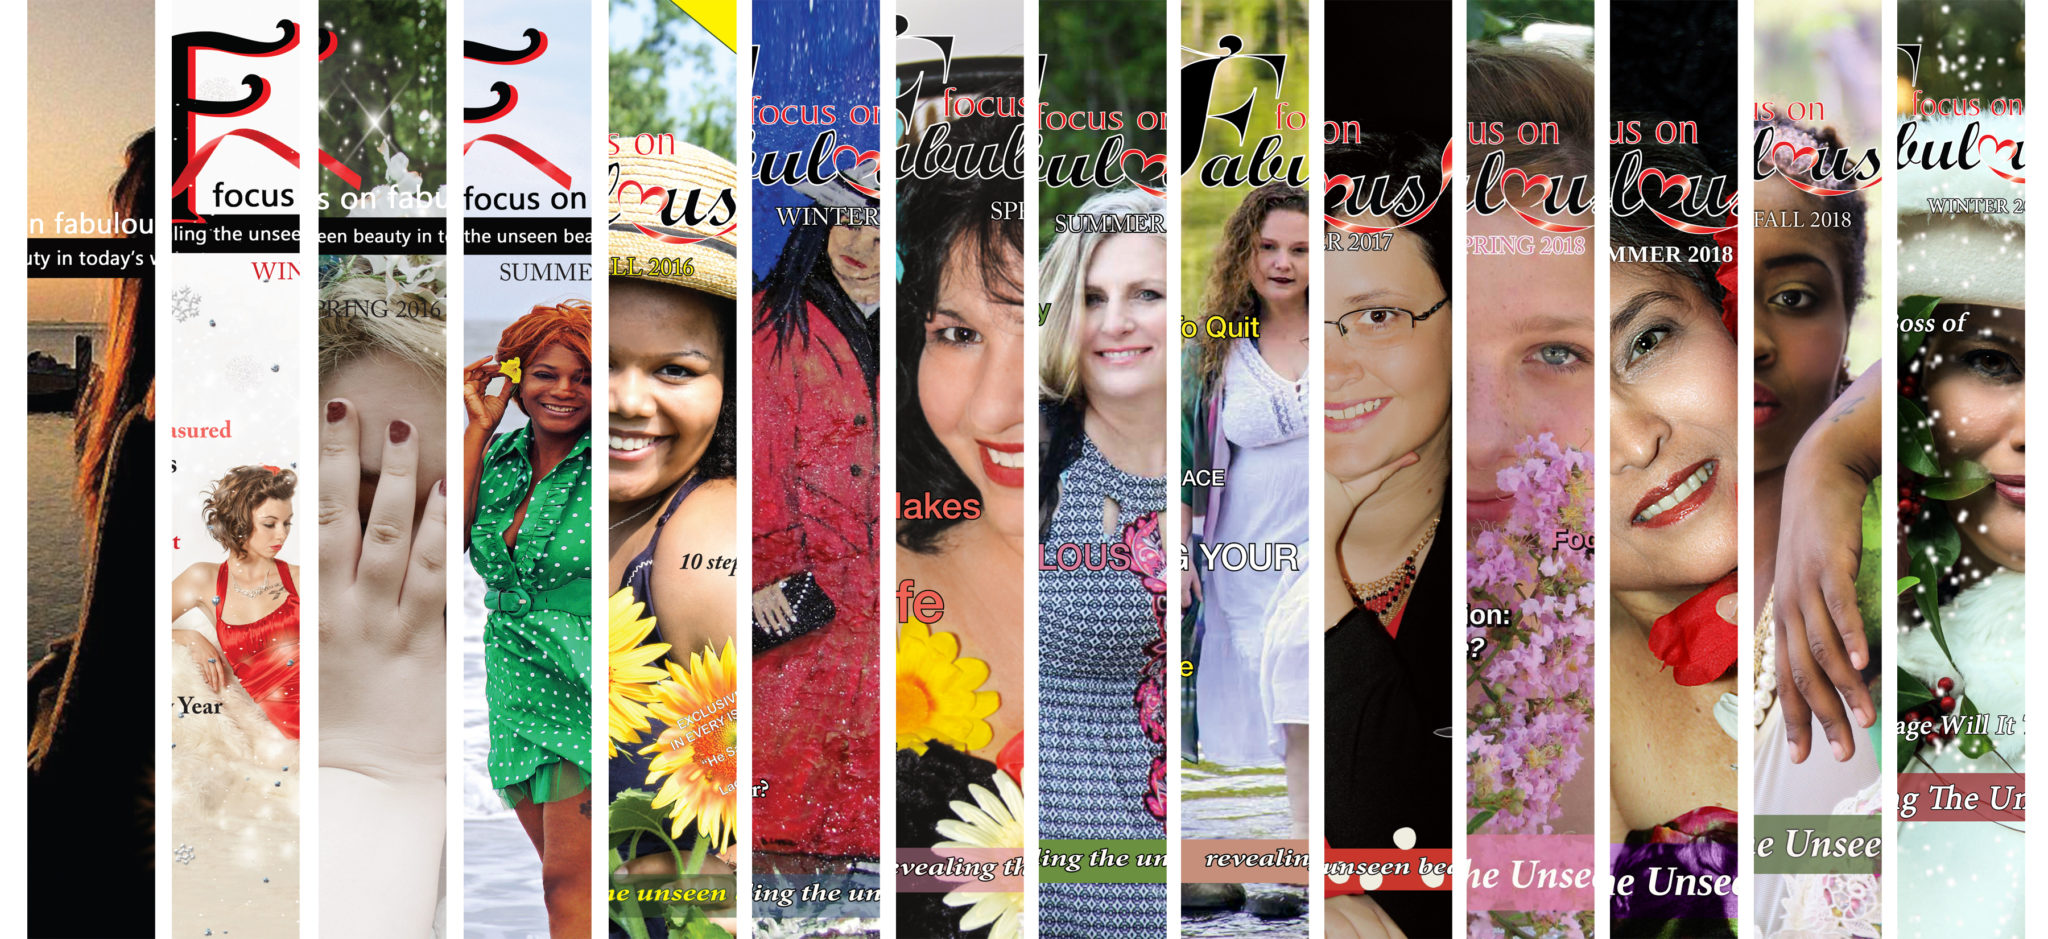 focus on fabulous magazine